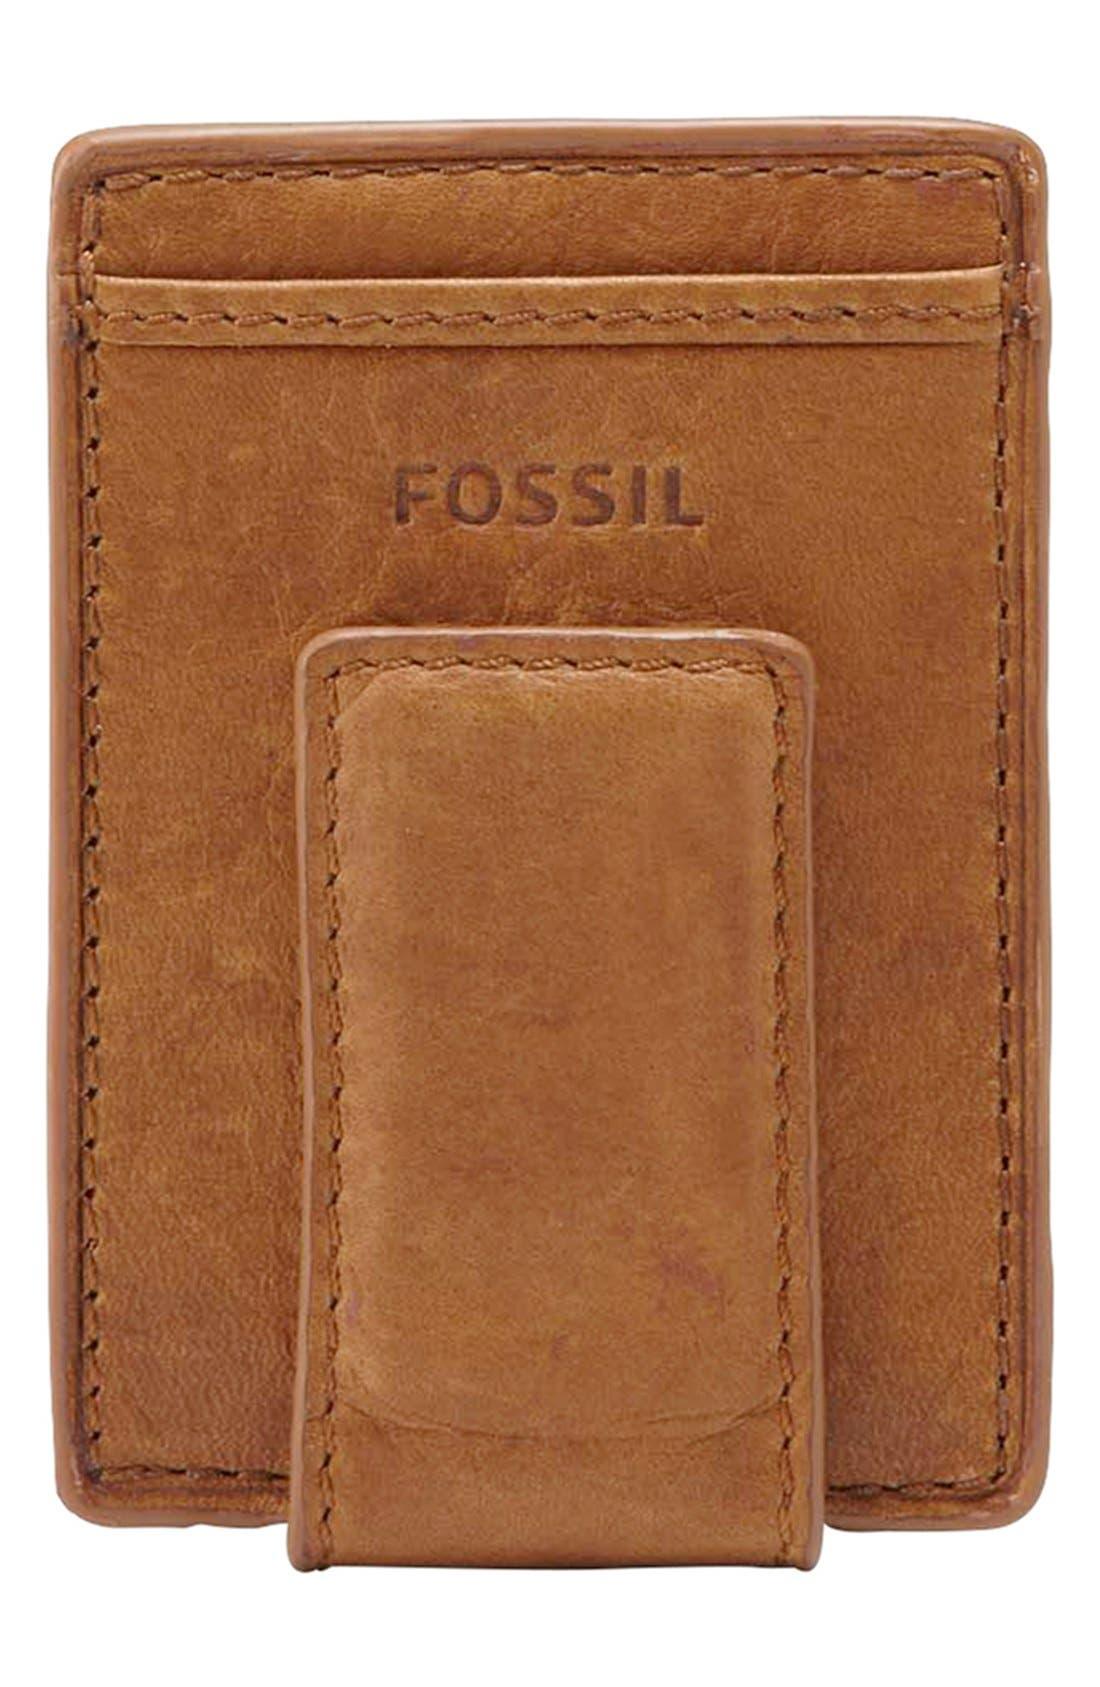 Alternate Image 1 Selected - Fossil 'Ingram' Leather Magnetic Money Clip Card Case